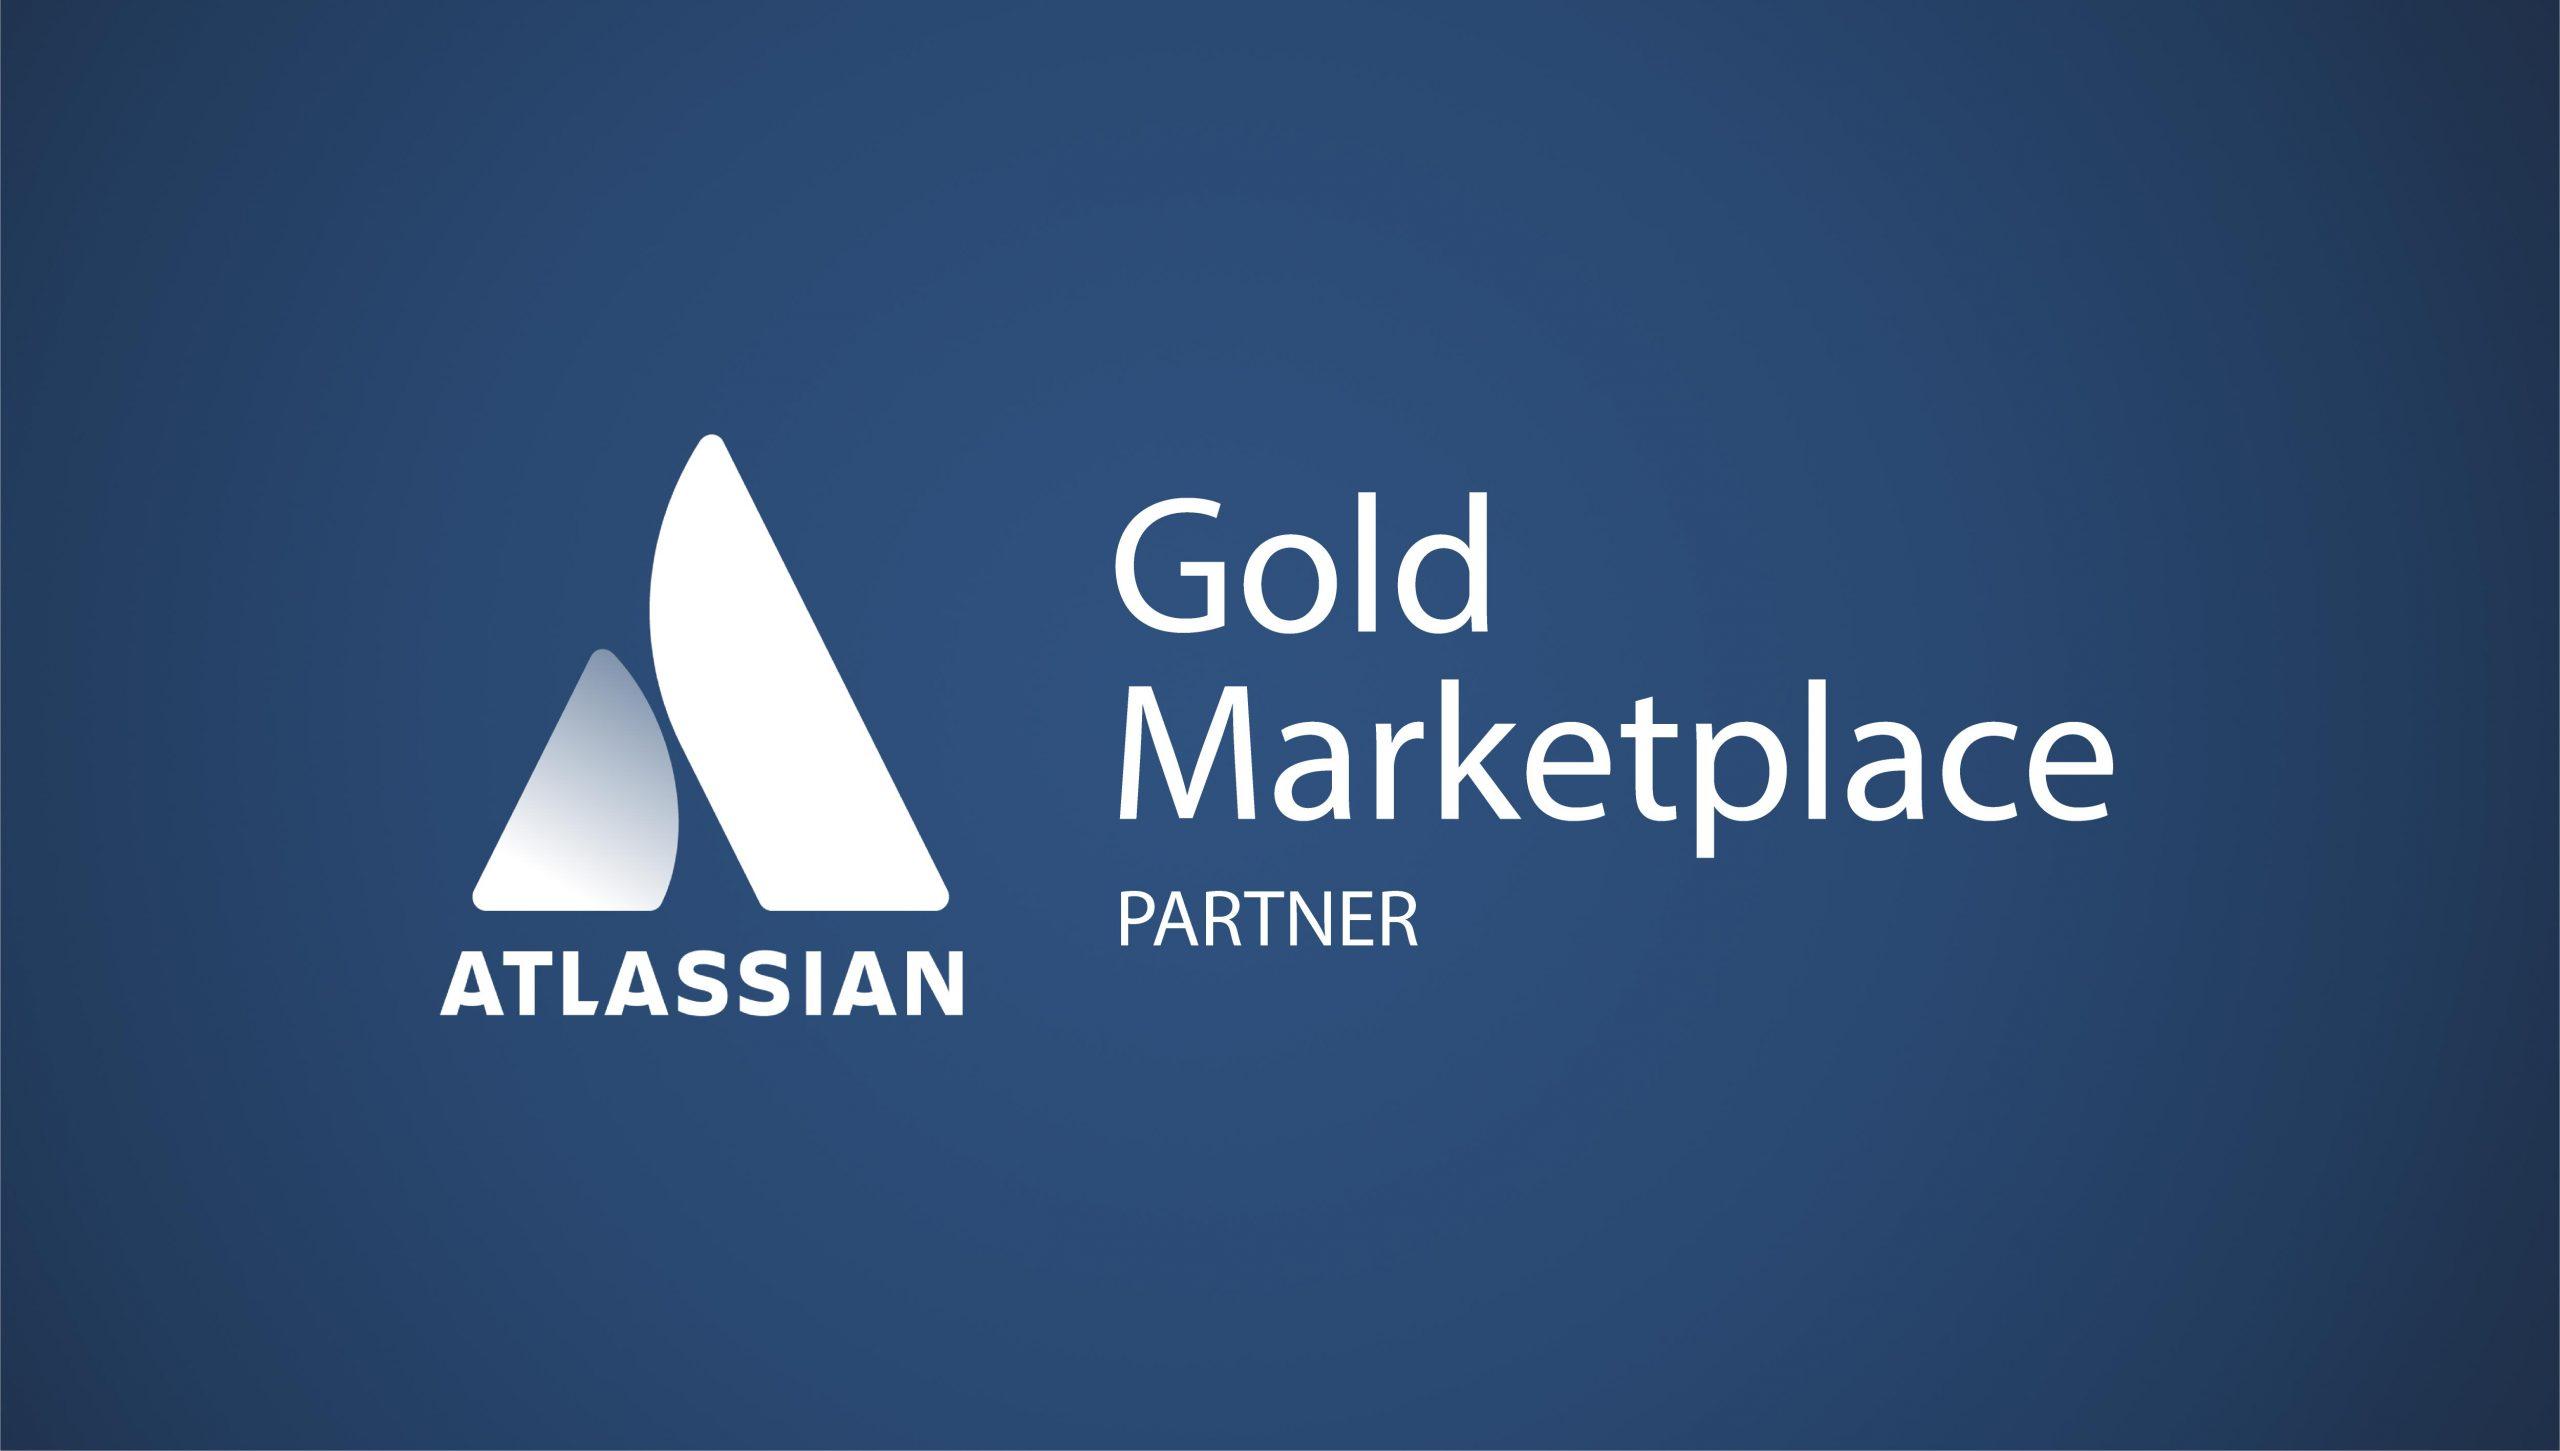 Dark blue background with Gold Marketplace Partner bage